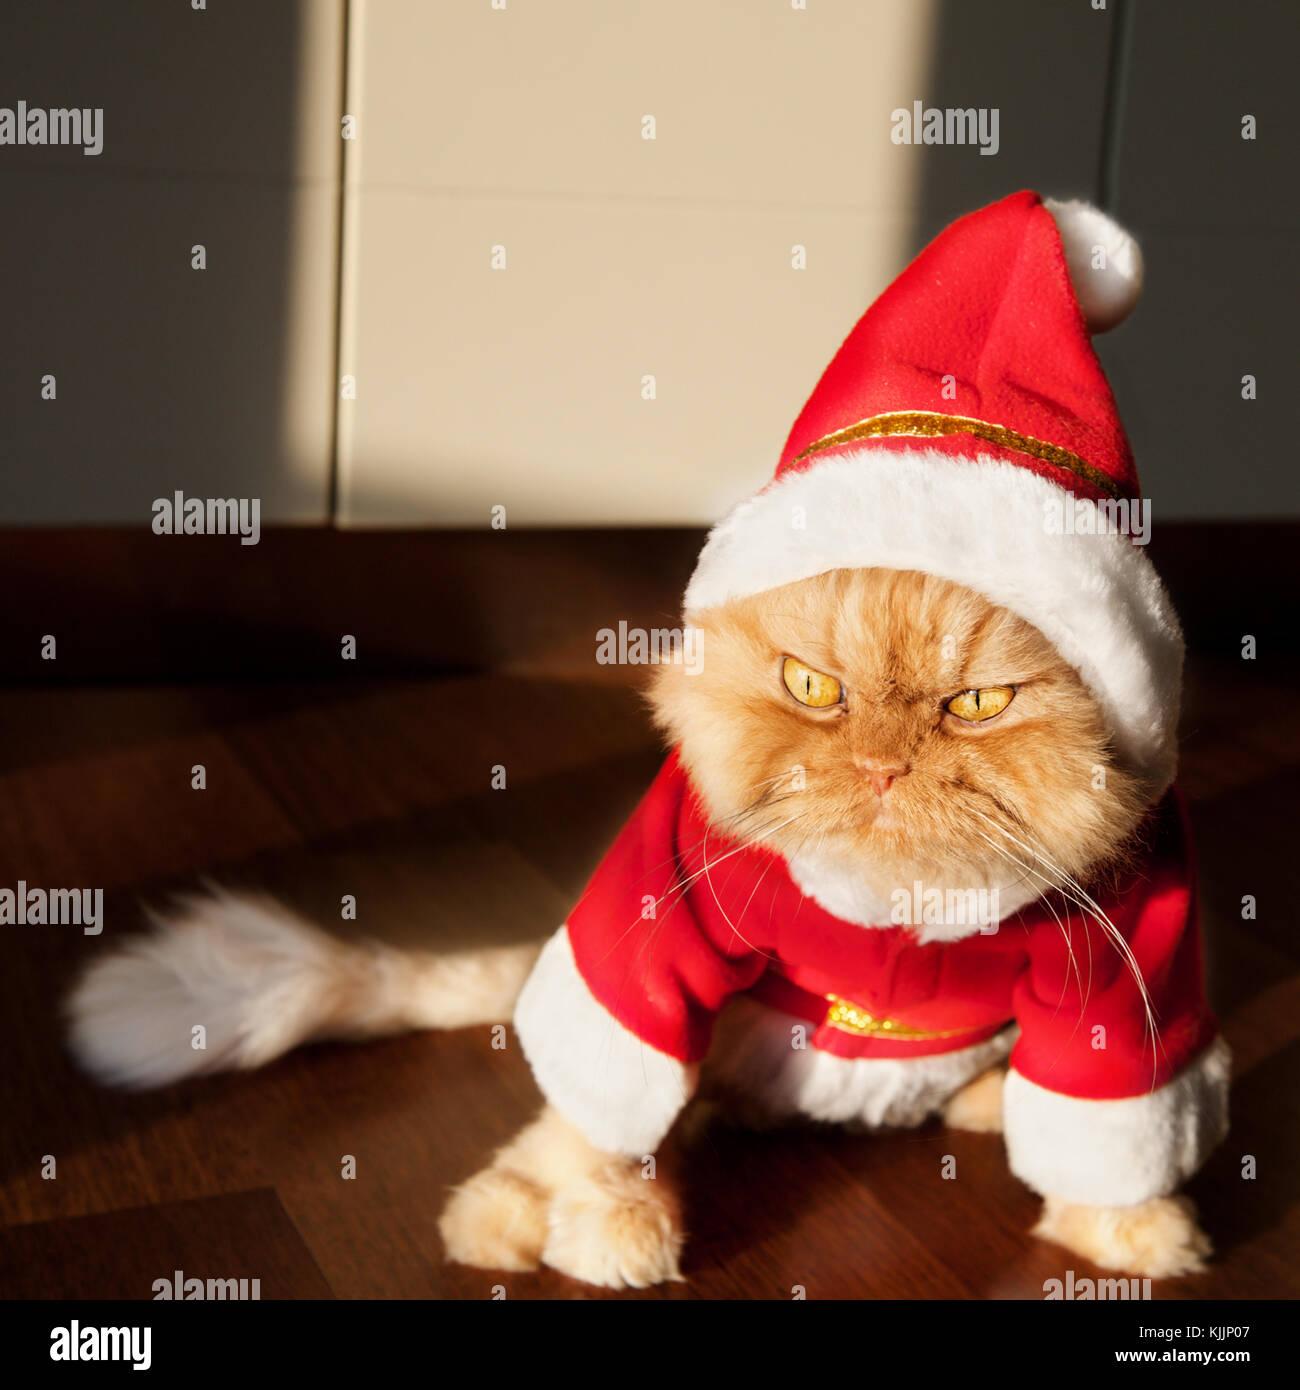 Santa Claus Cat - Stock Image